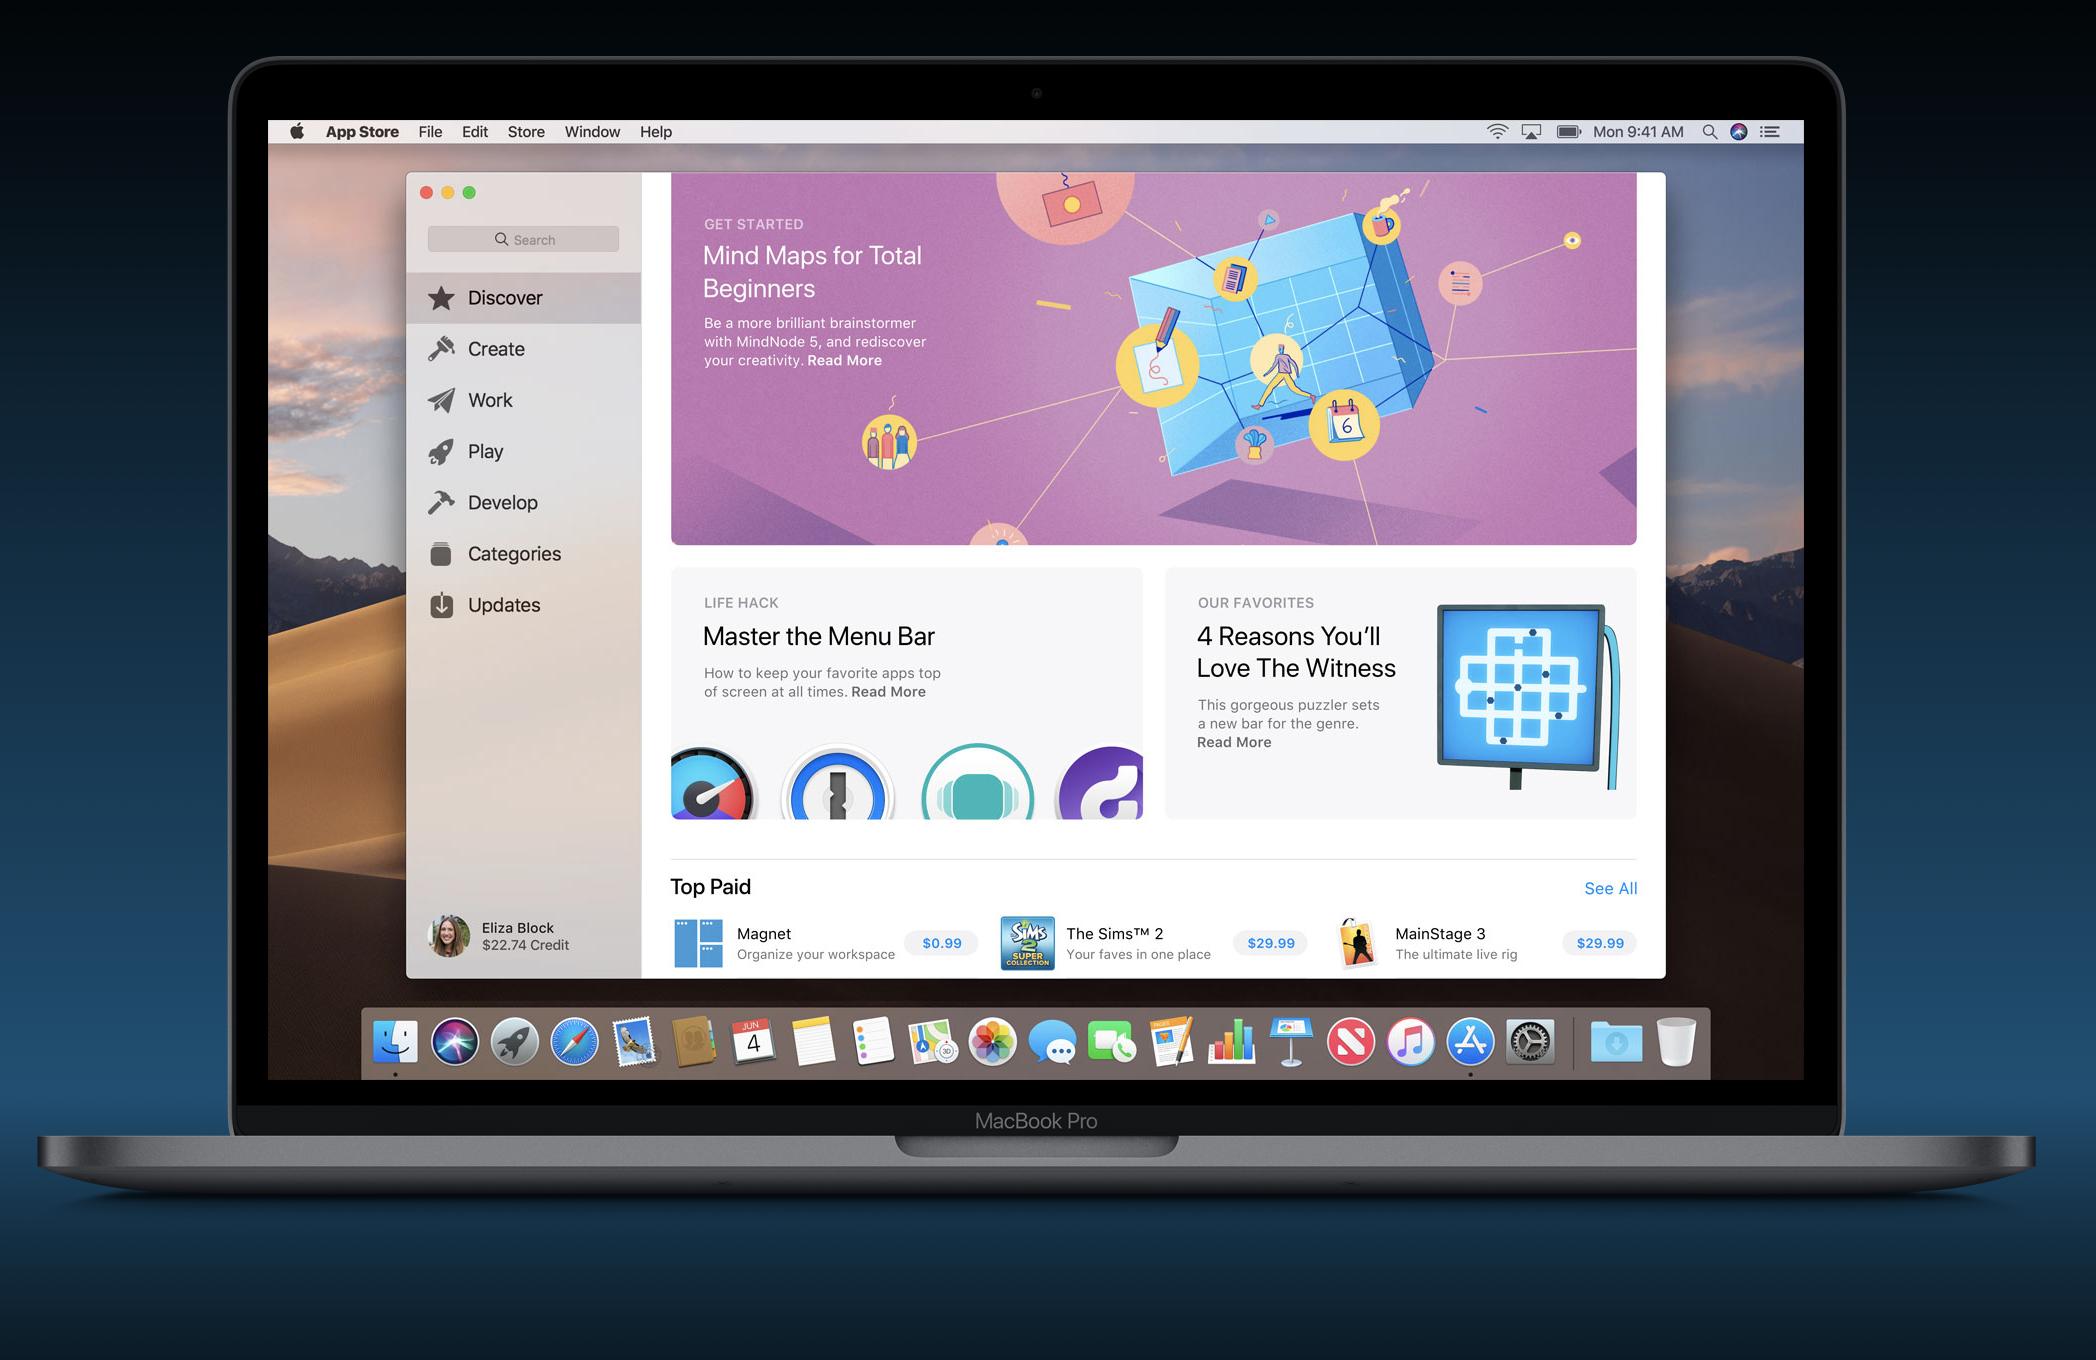 New-Mac-appstore-MacOS-Mojave-Apple-2018